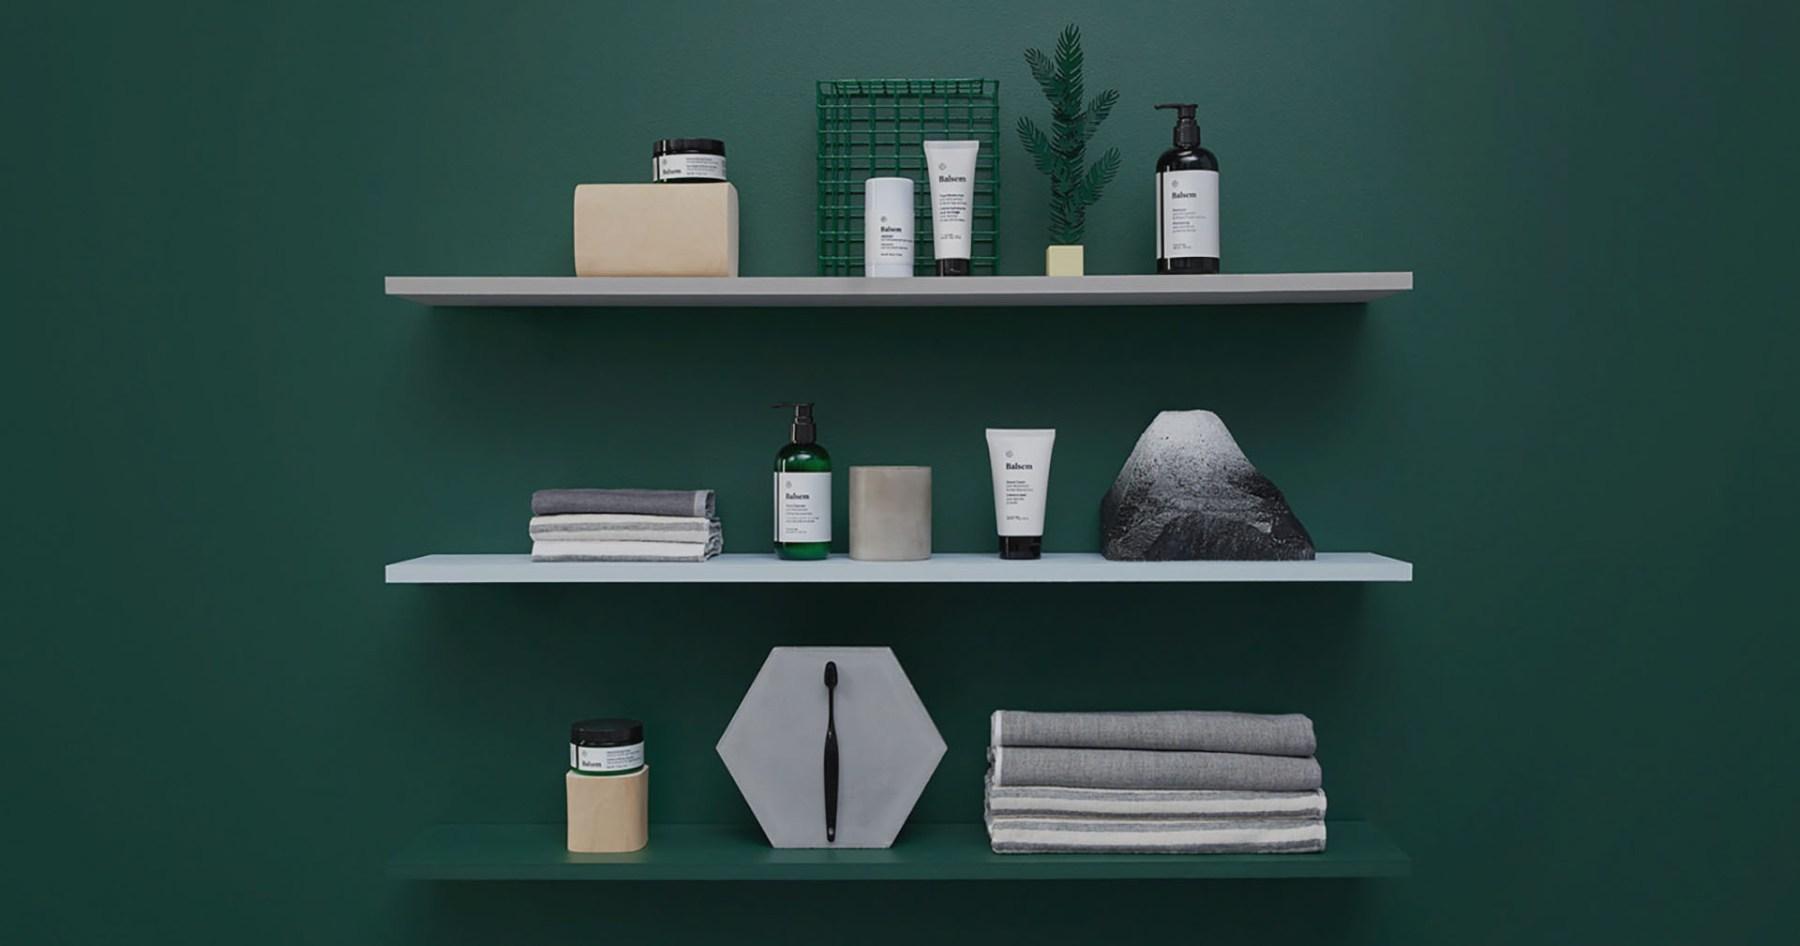 Frank & Oak's Got Your Winter Skin Survival Kit